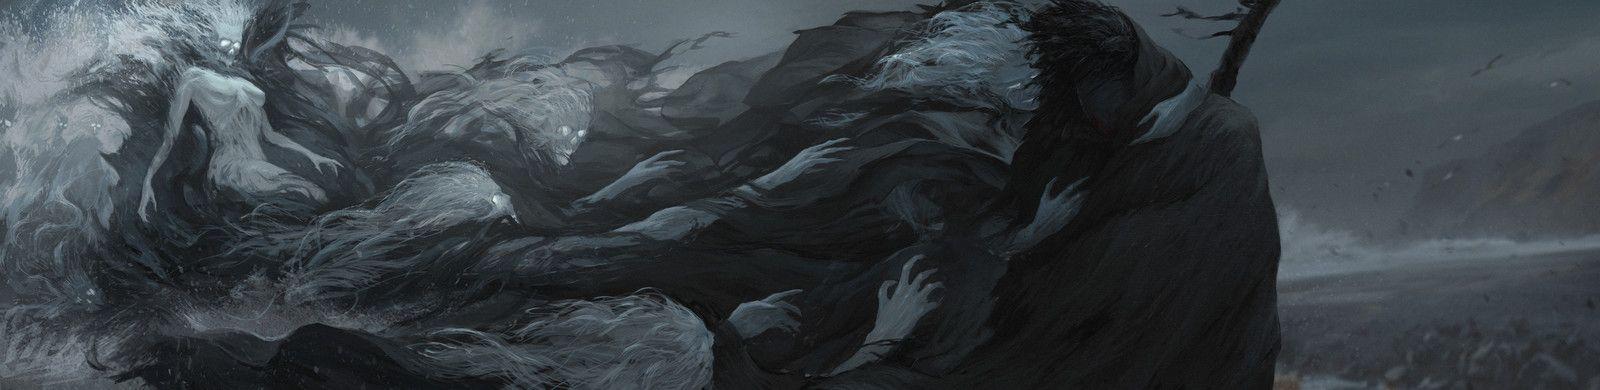 Death call, Artem Demura on ArtStation at https://www.artstation.com/artwork/RggdX